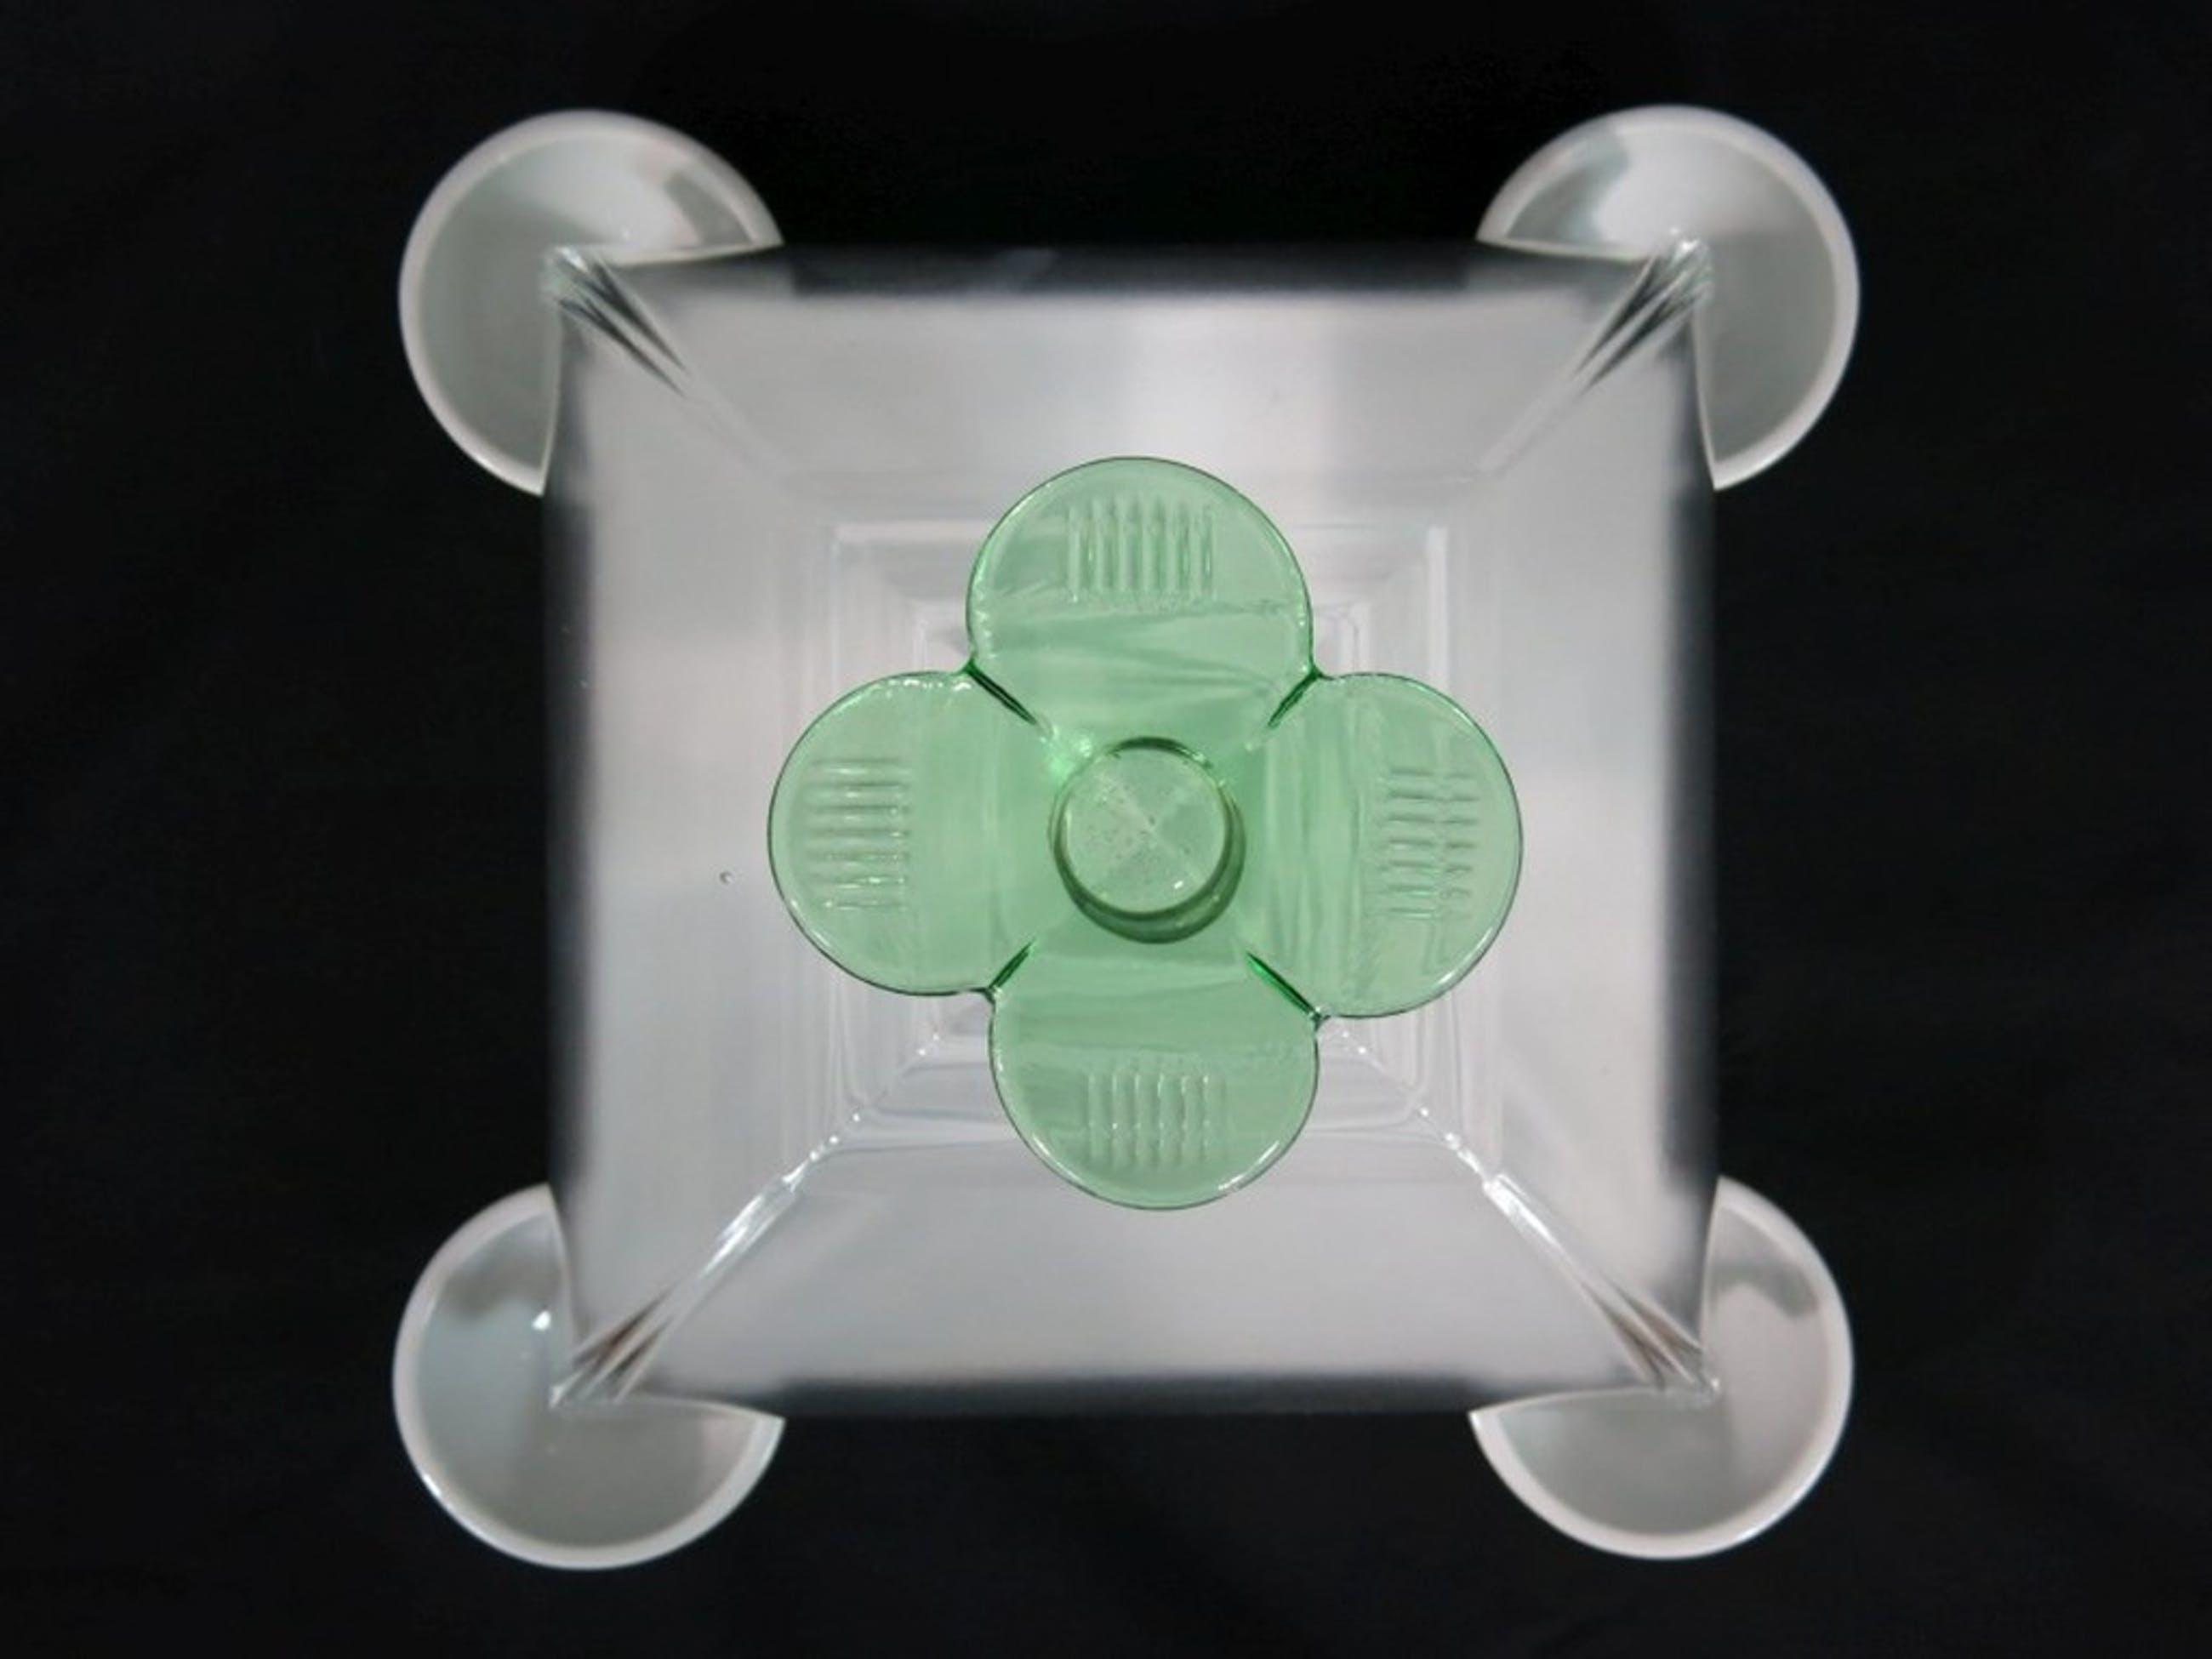 Borek Sipek Stoel : Borek sipek glazen stolp met groene bloem op wit porseleinen